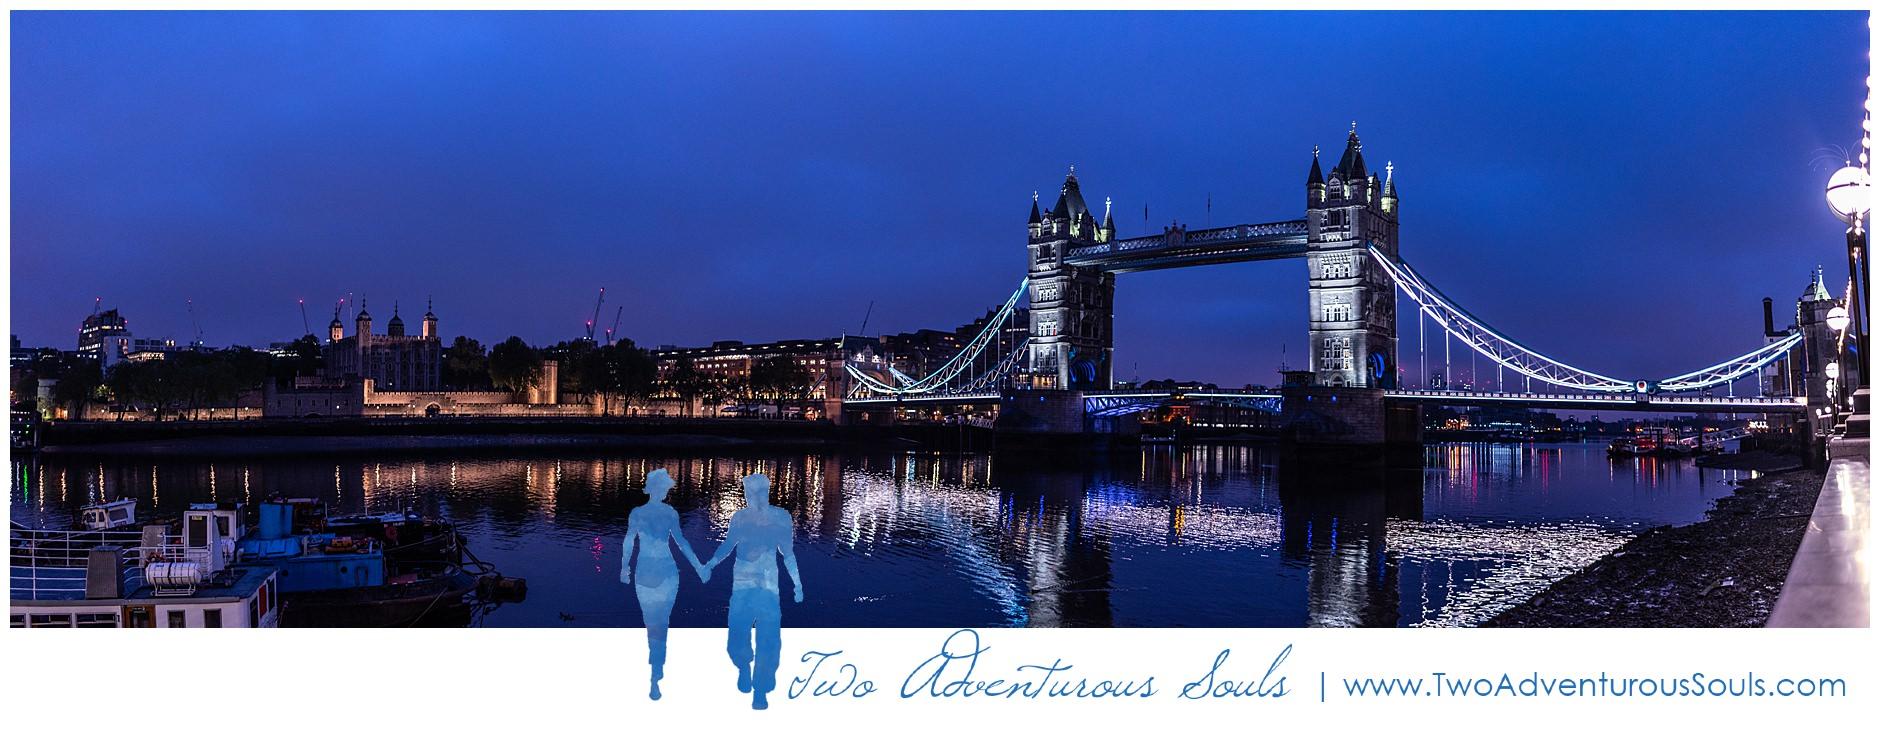 Photographers bucket list, destination wedding photographers, travel photographers2.jpg